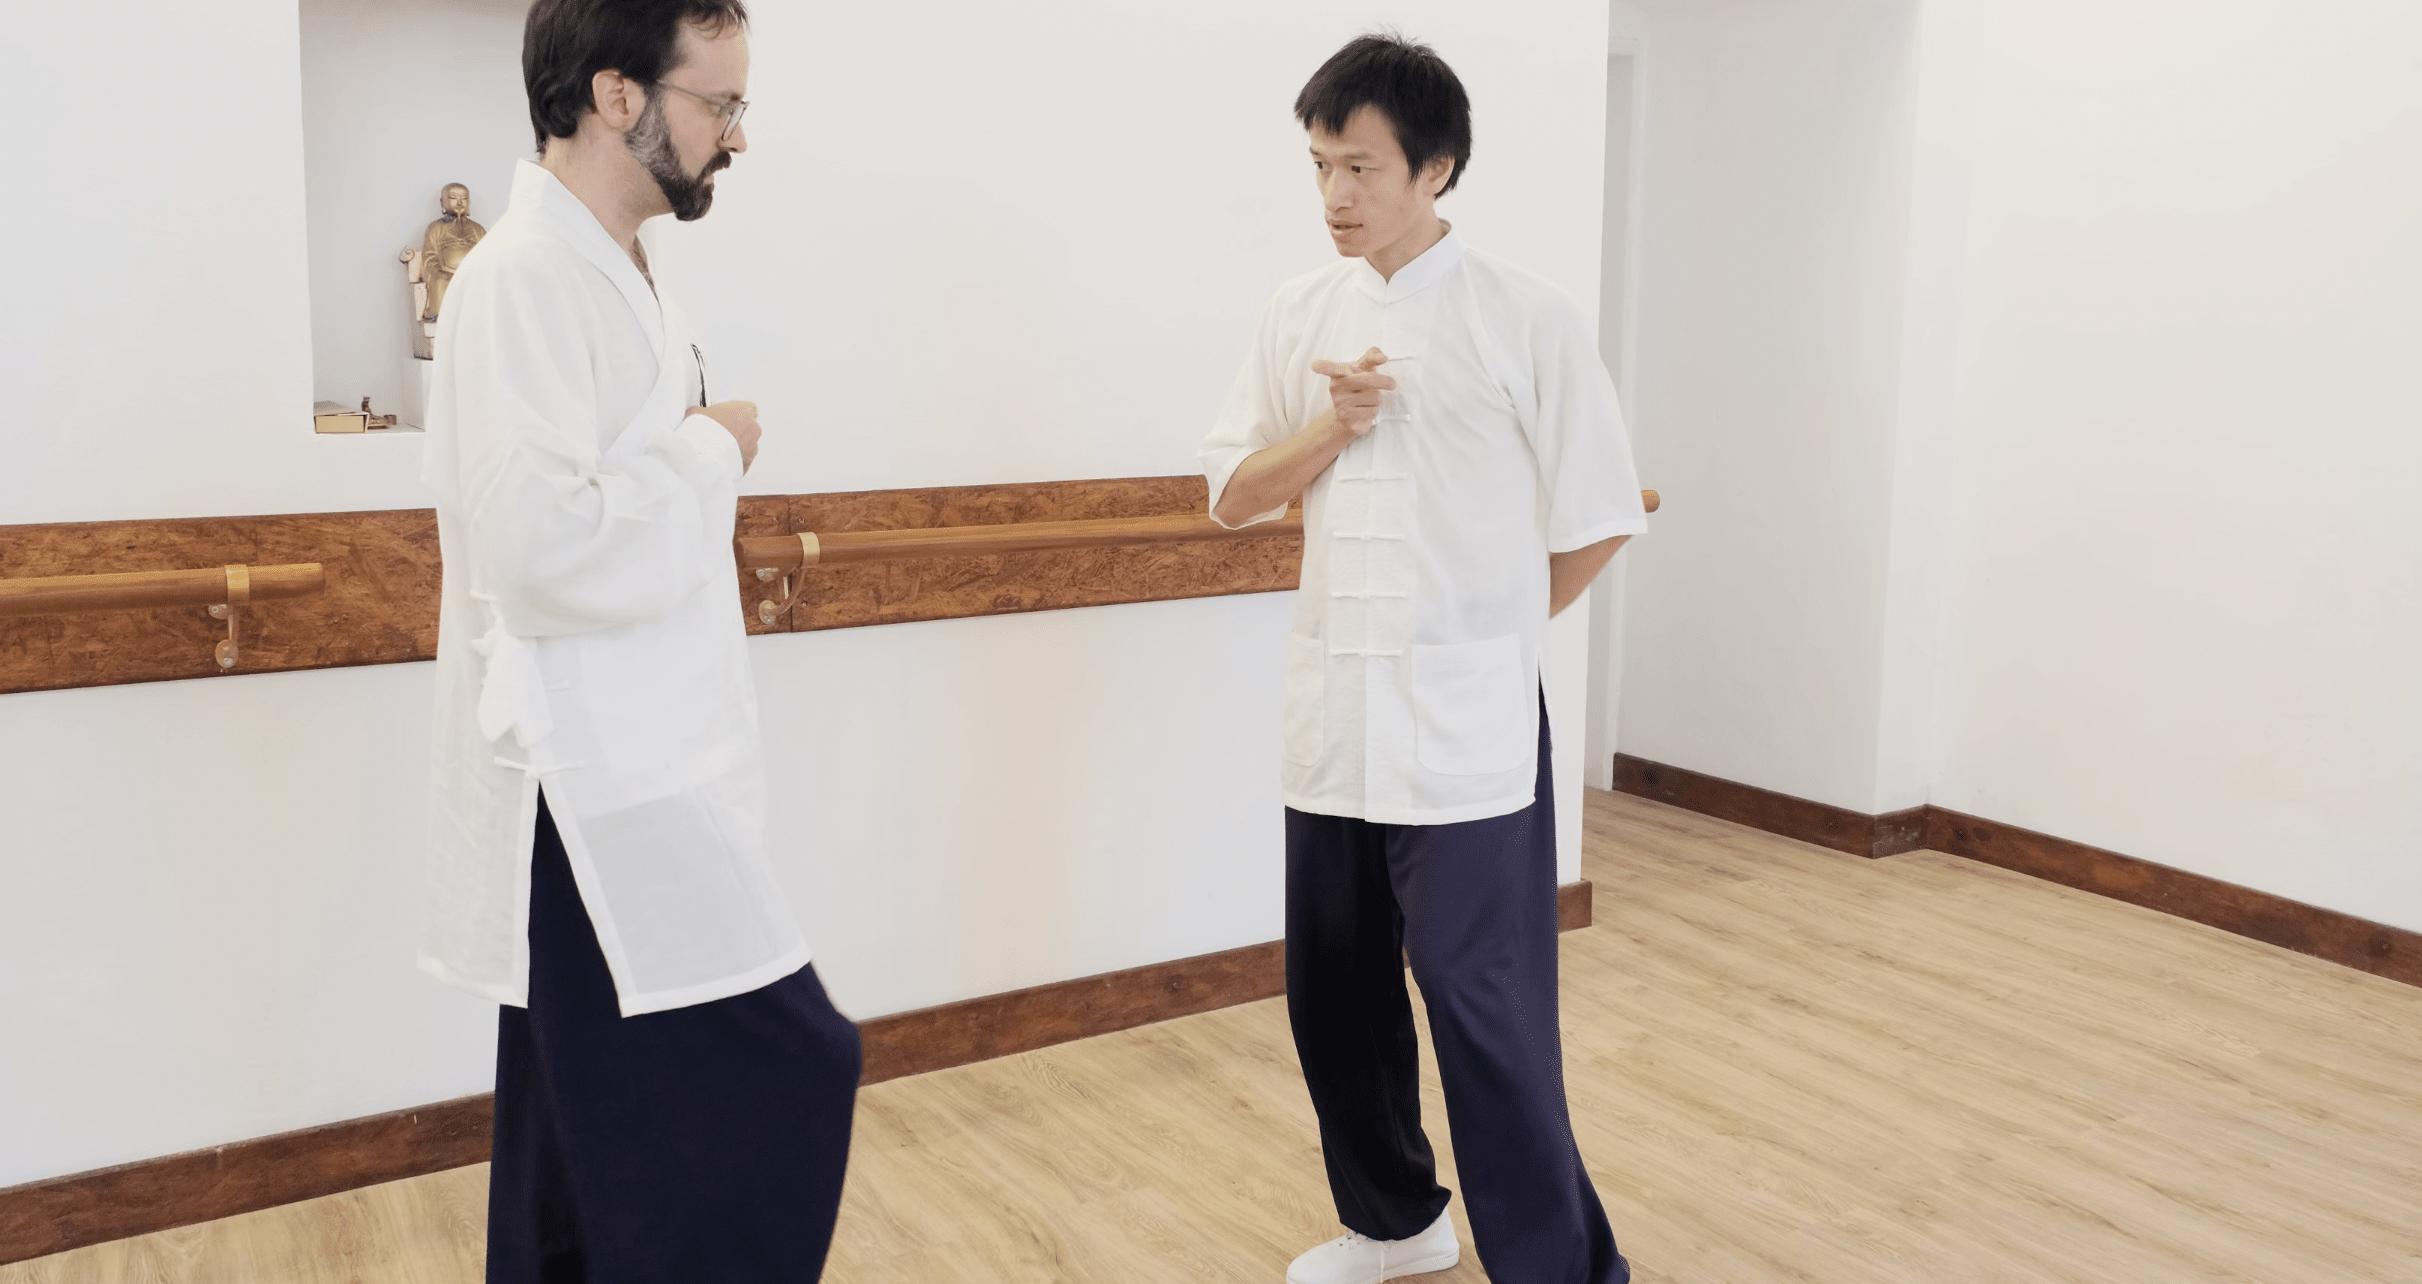 Learning About Spiral Dynamics – Internal Taiji Principles